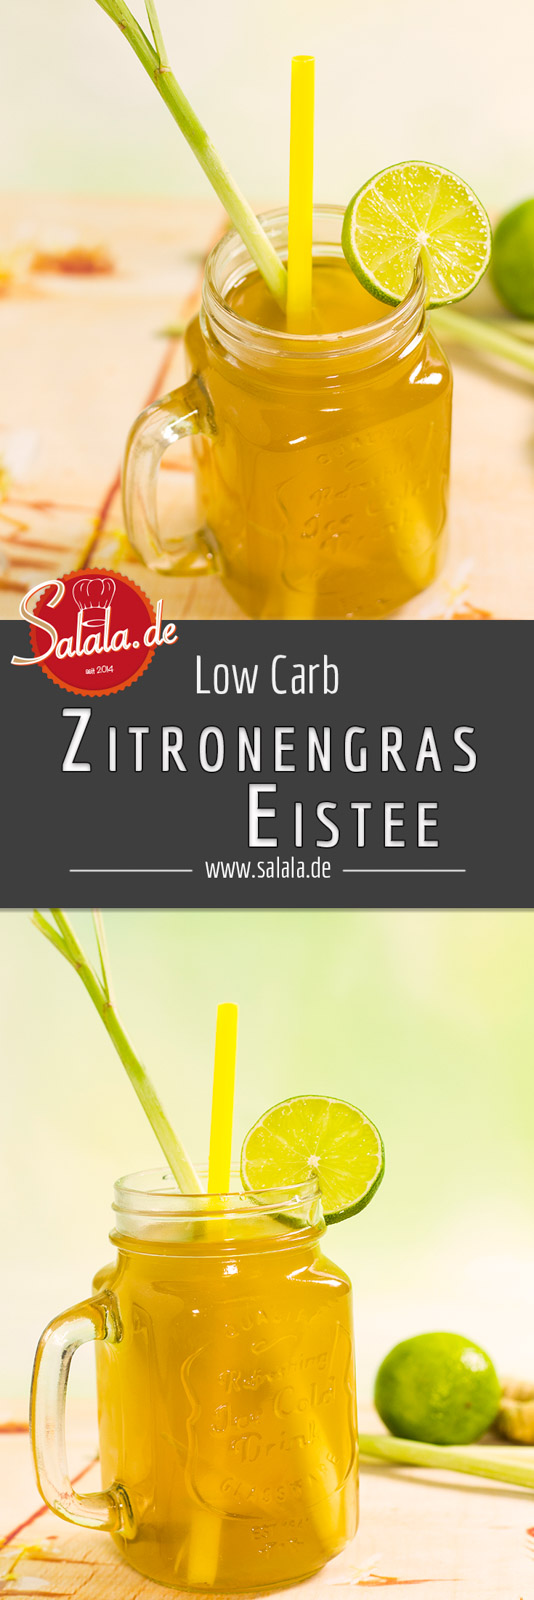 Zitronengras Eistee - by salala.de - ohne Zucker selber machen Low Carb Rezept